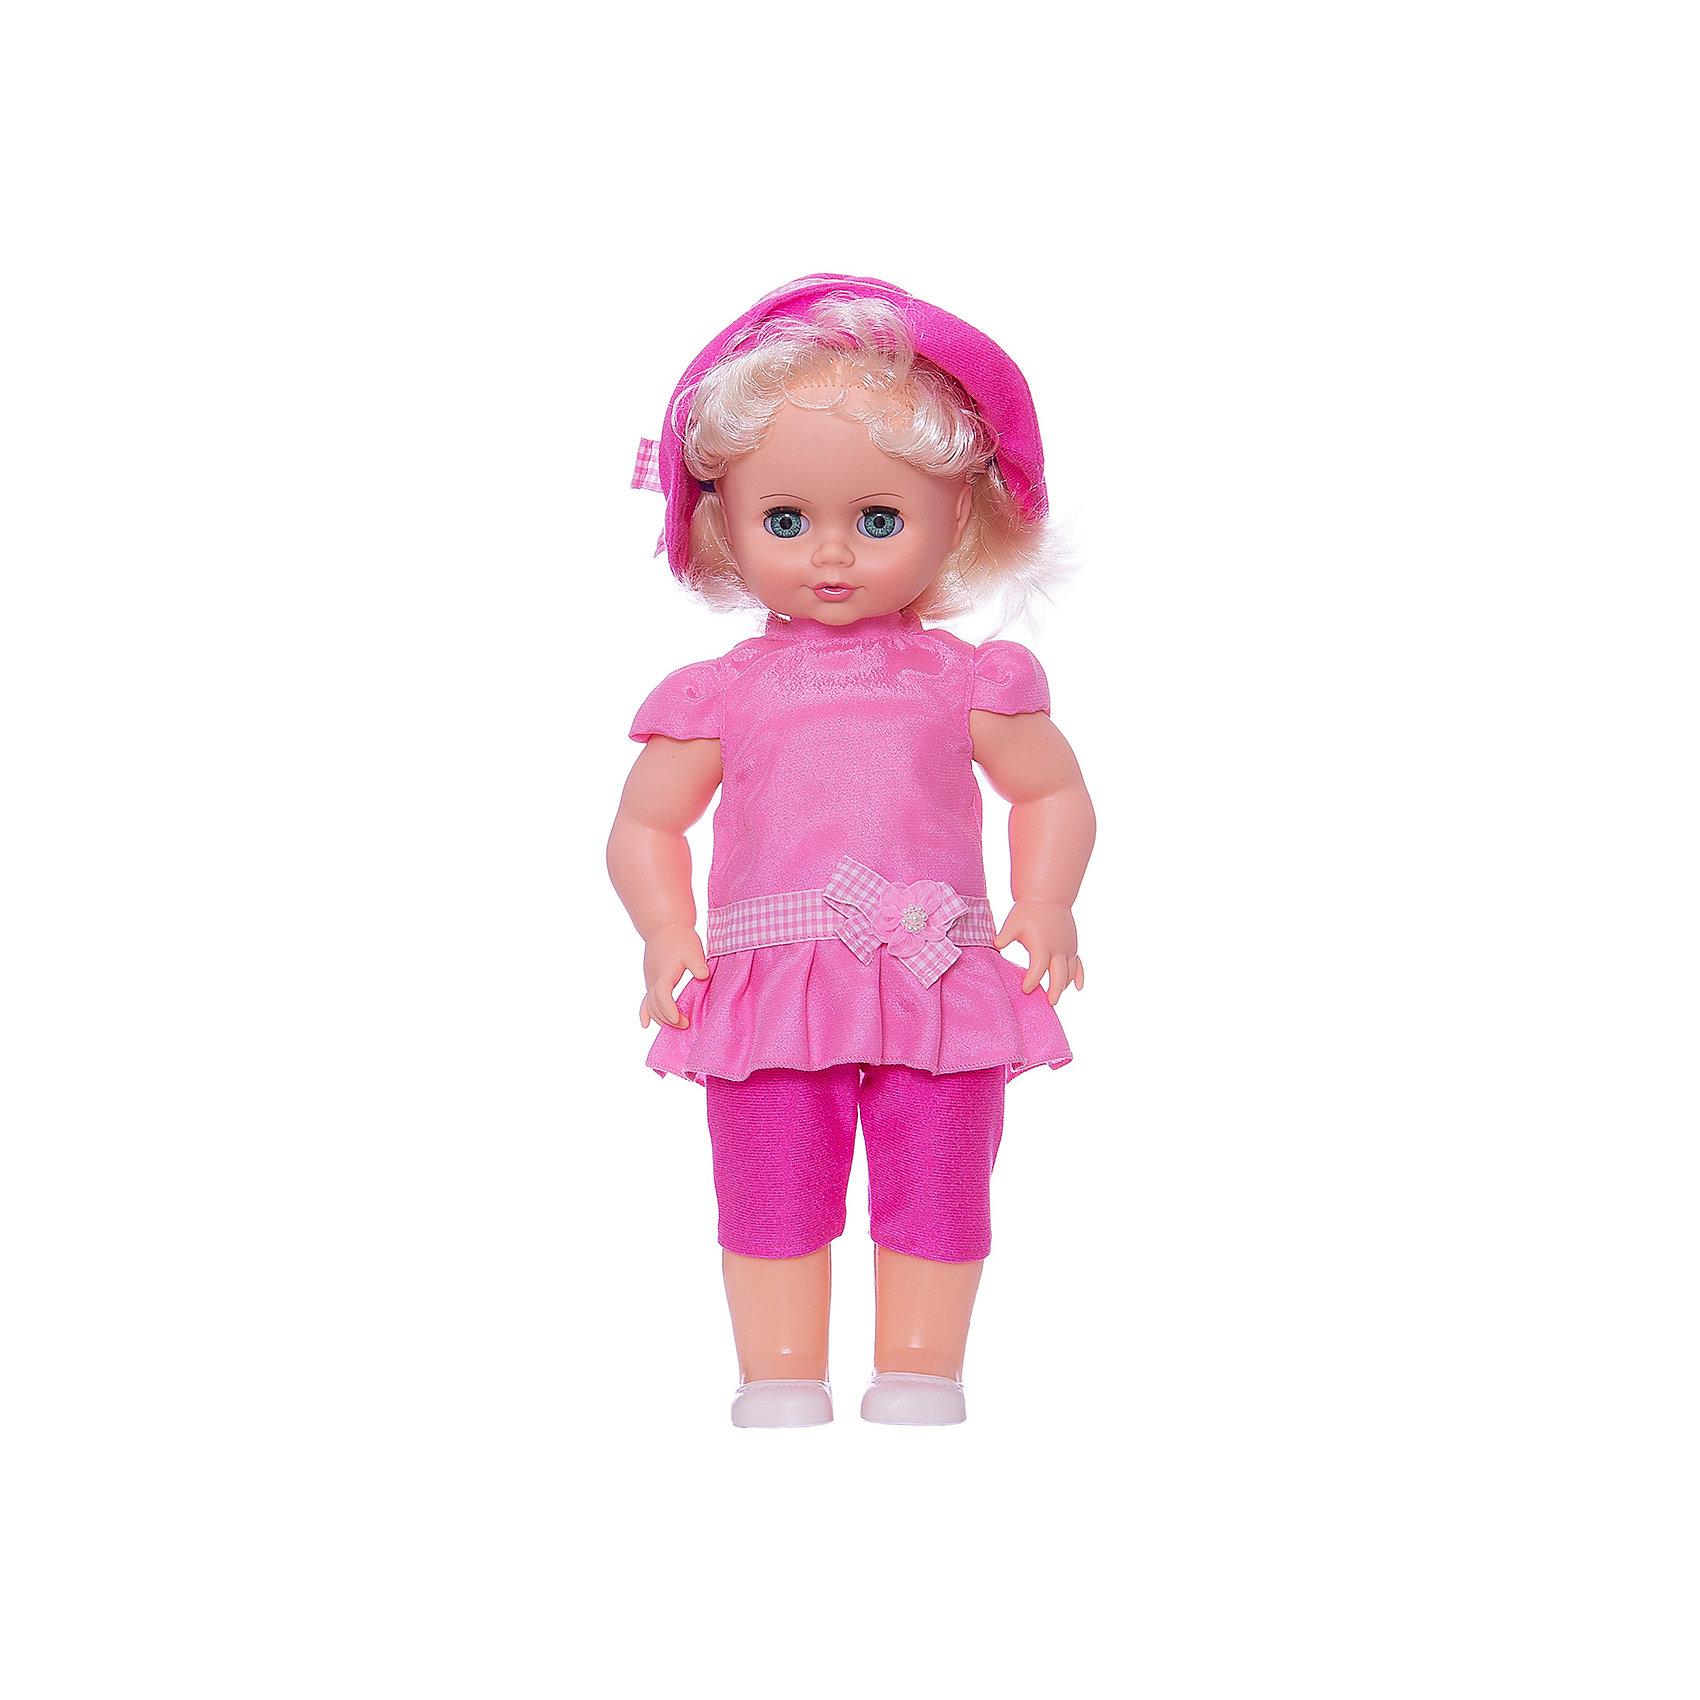 Весна Кукла Инна 49, со звуком, Весна кукла весна алсу 35 см со звуком в1634 о